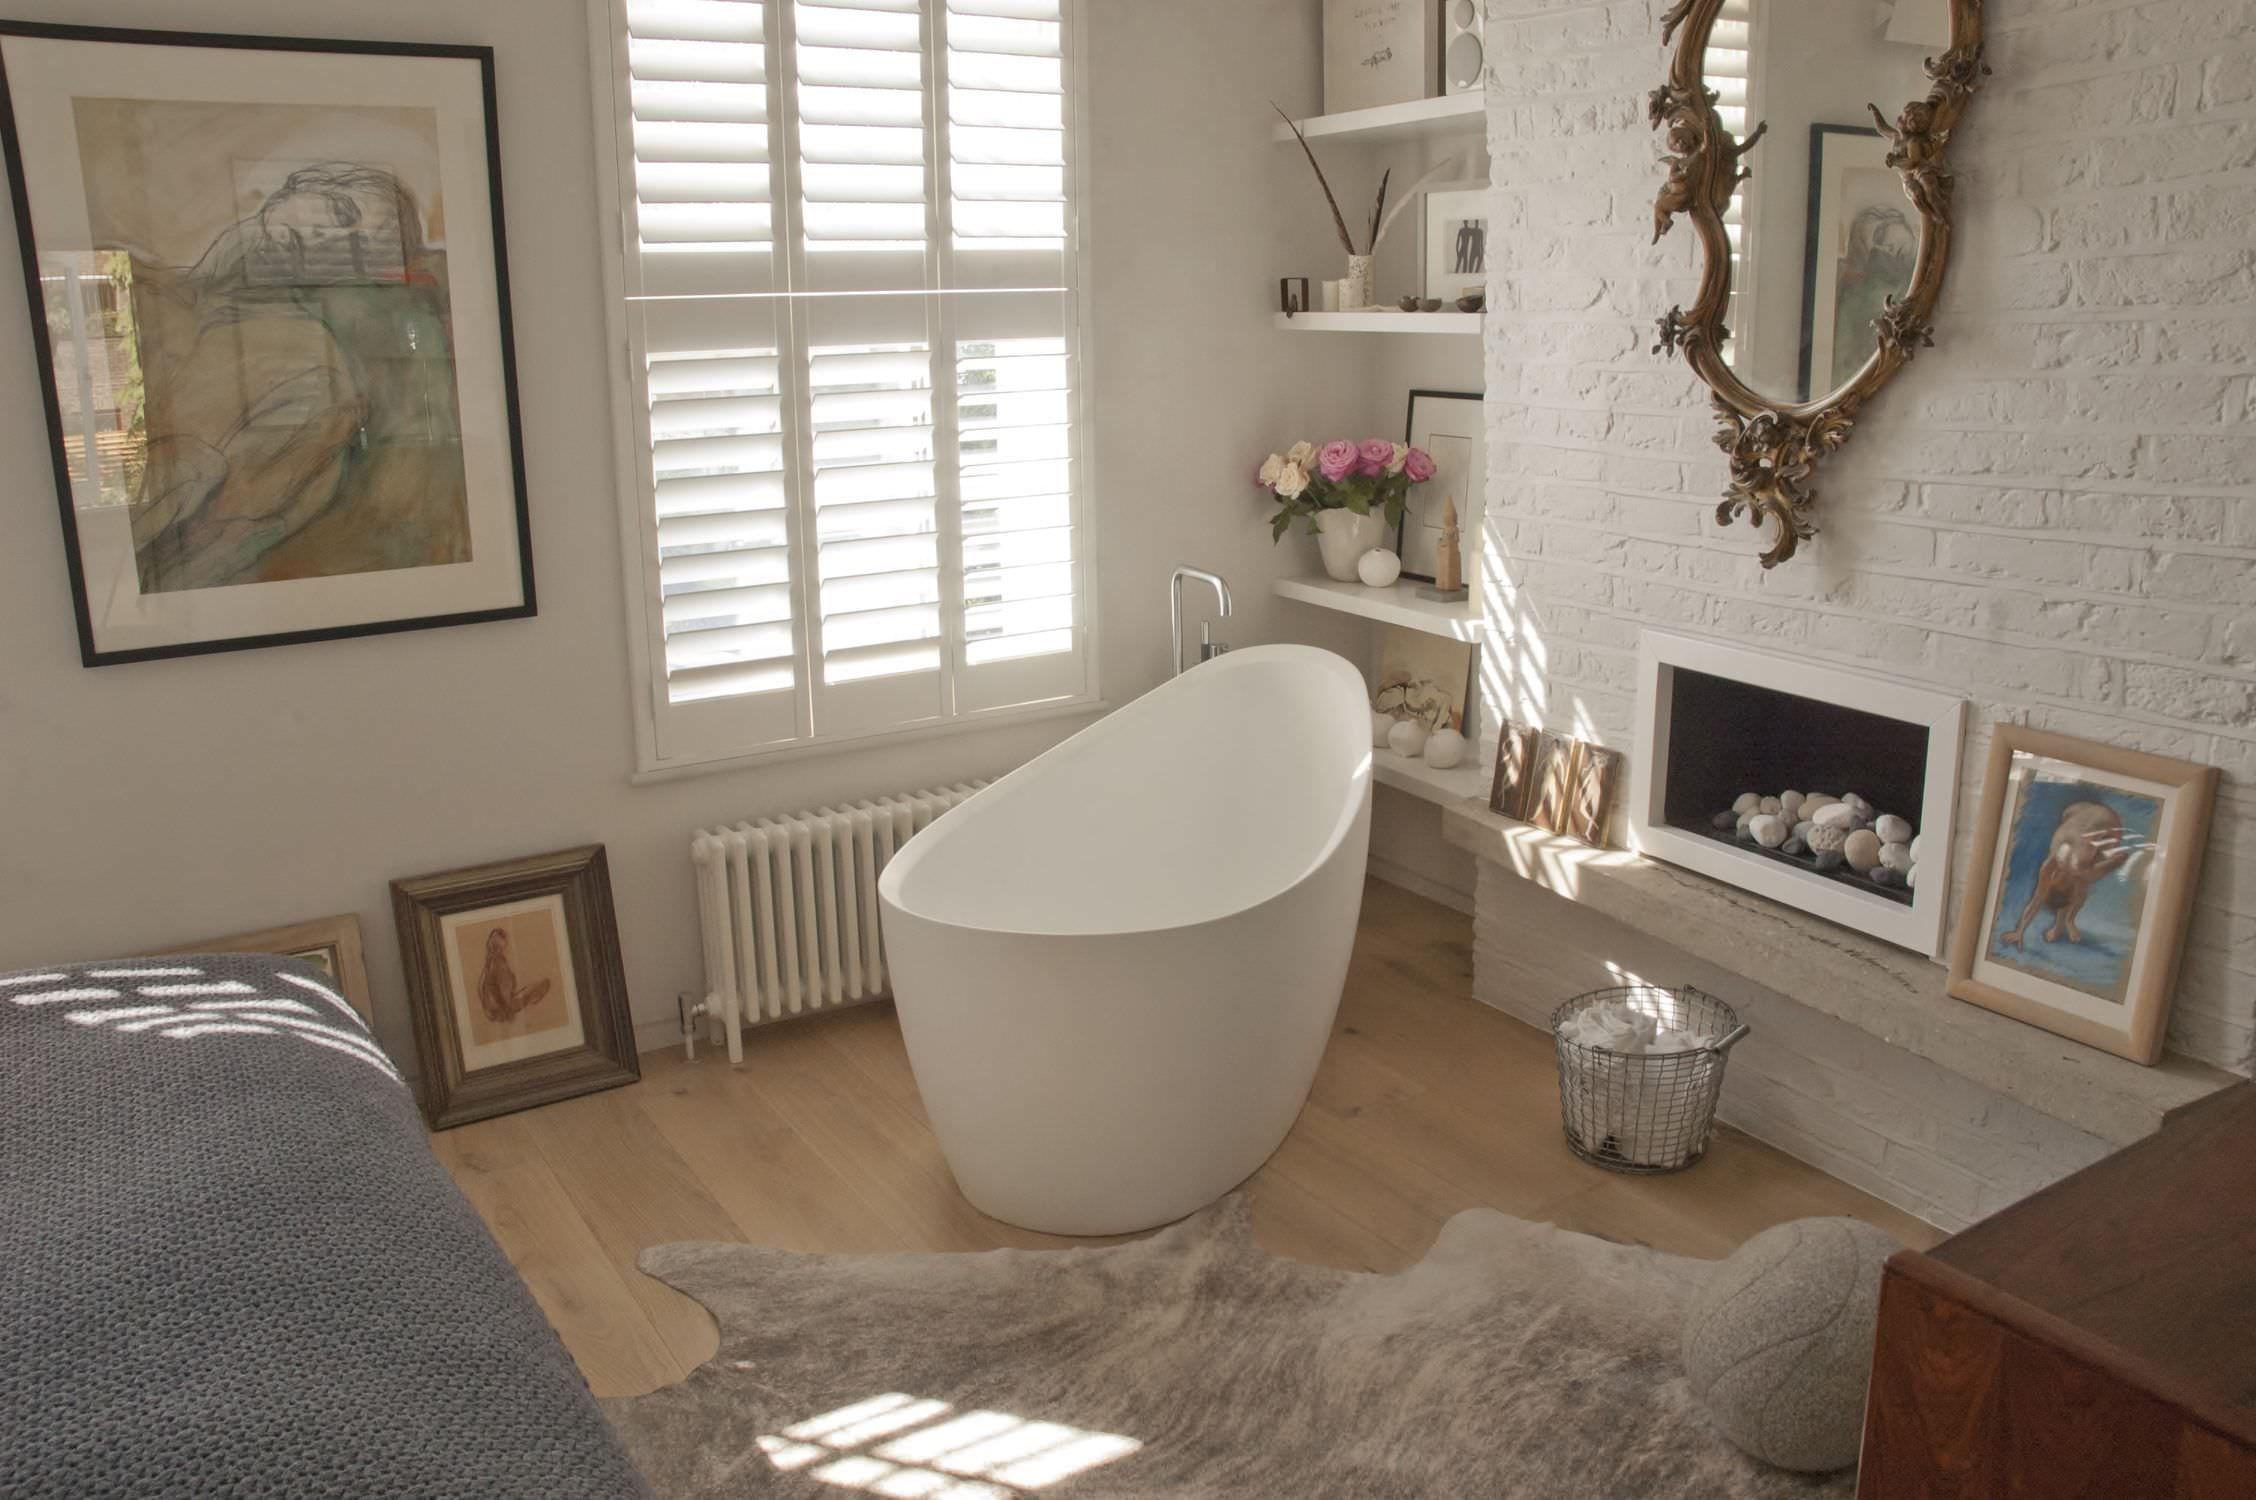 Freestanding White Porcelain Bathtub On Natural Wooden Floor In Artistic  Bathroom Decoration, Innovative Small Freestanding Bathtub For Remodeling  Bathroom ...